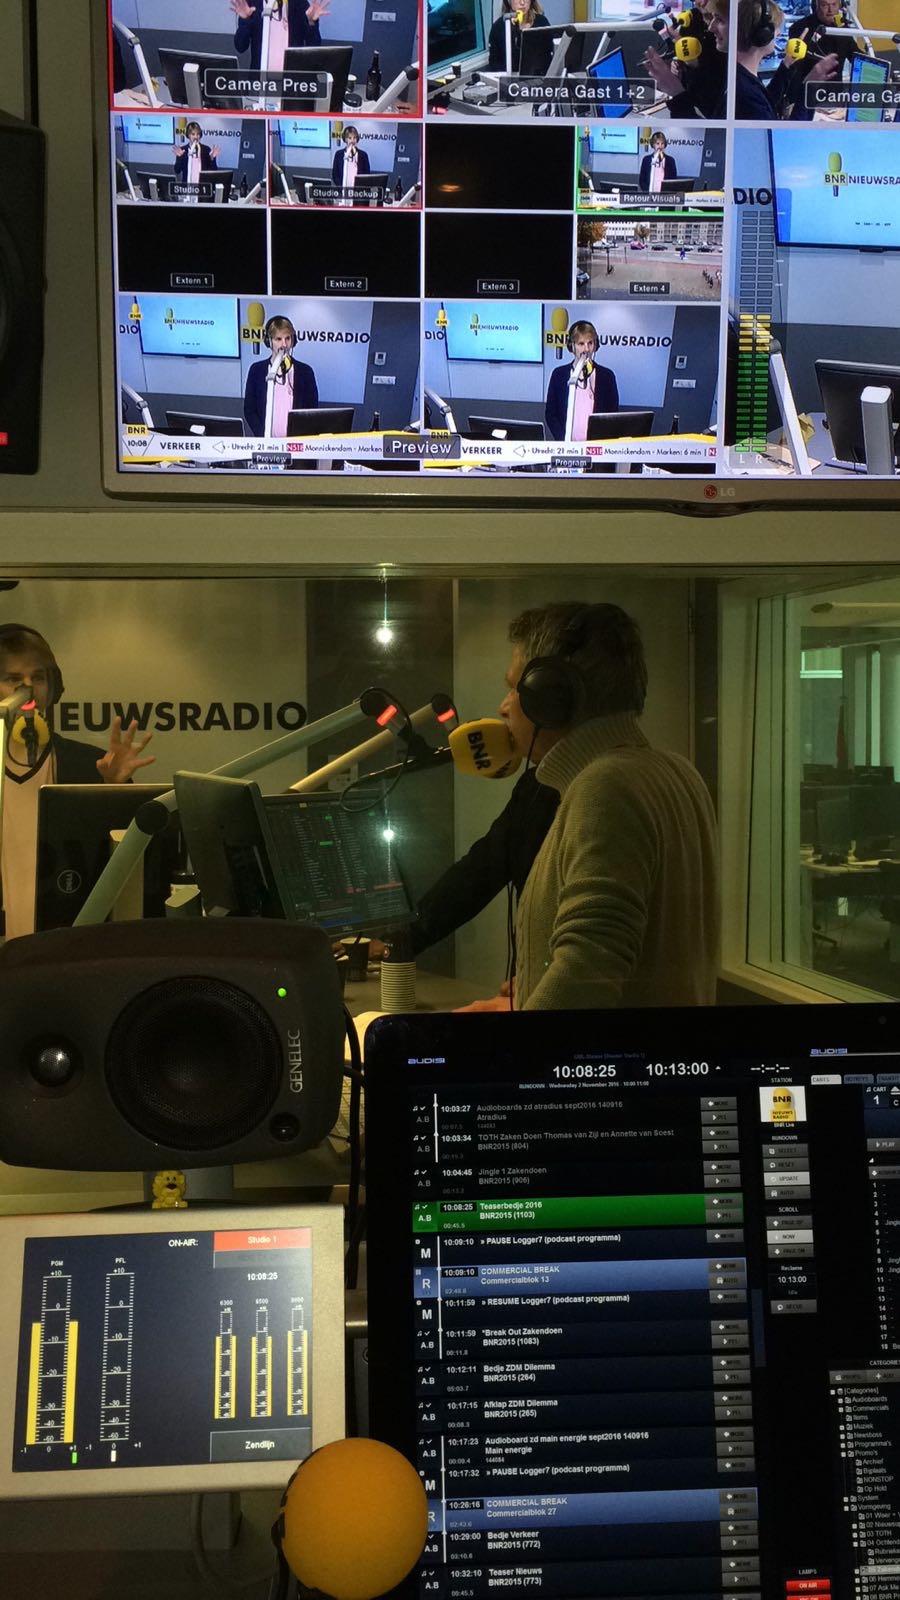 BNR EFFIE 2016 INTERVIEW, LUISTER ONDERSTAAND